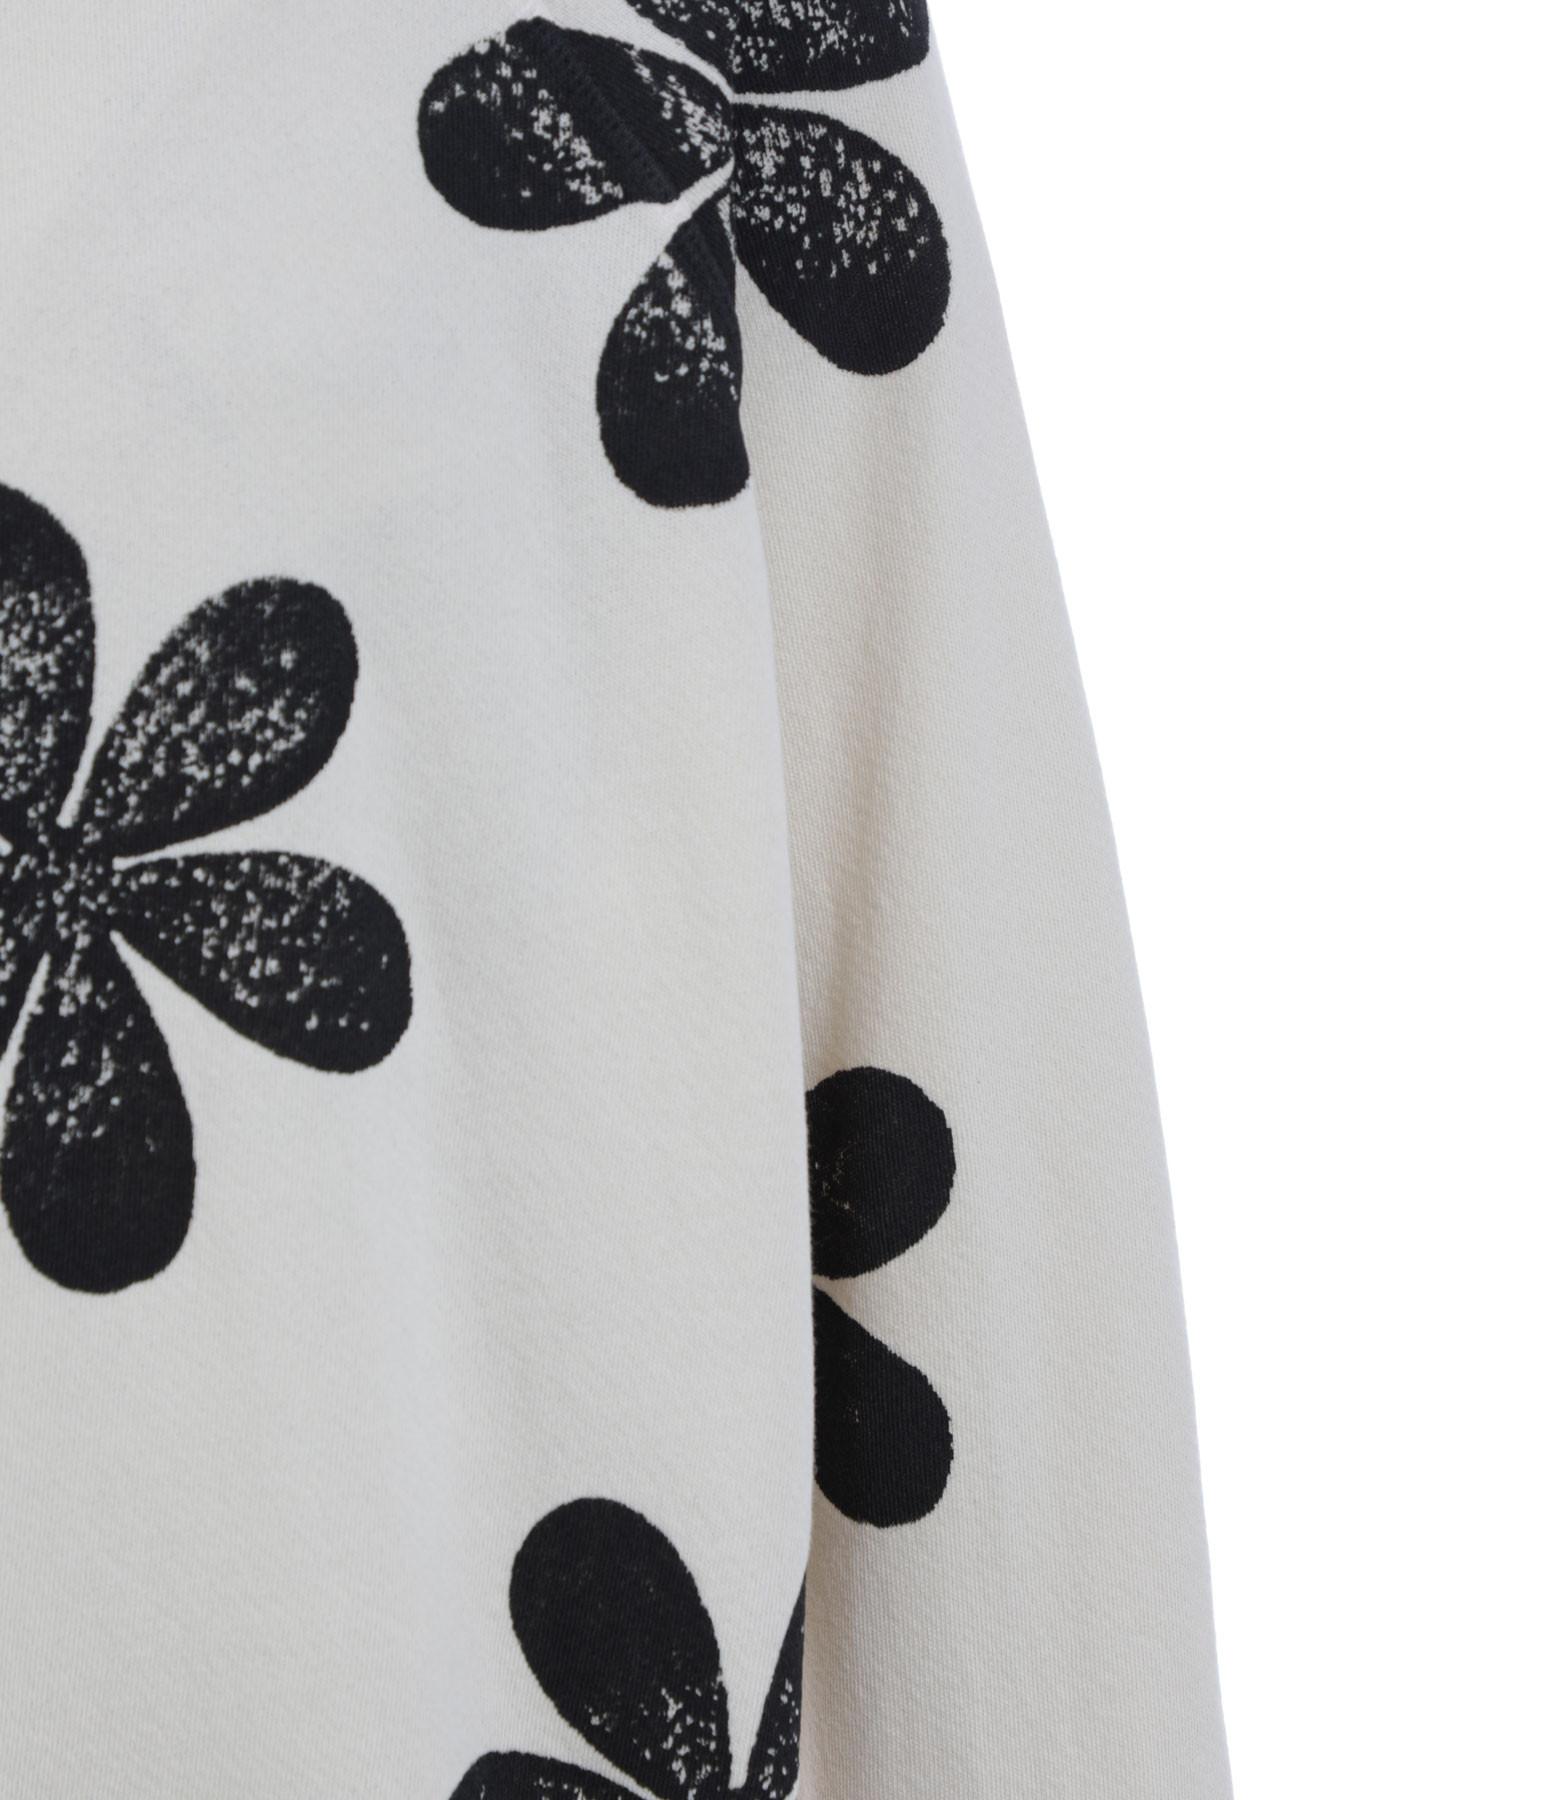 THE GREAT - Sweatshirt The Slouch Coton Blanc Délavé